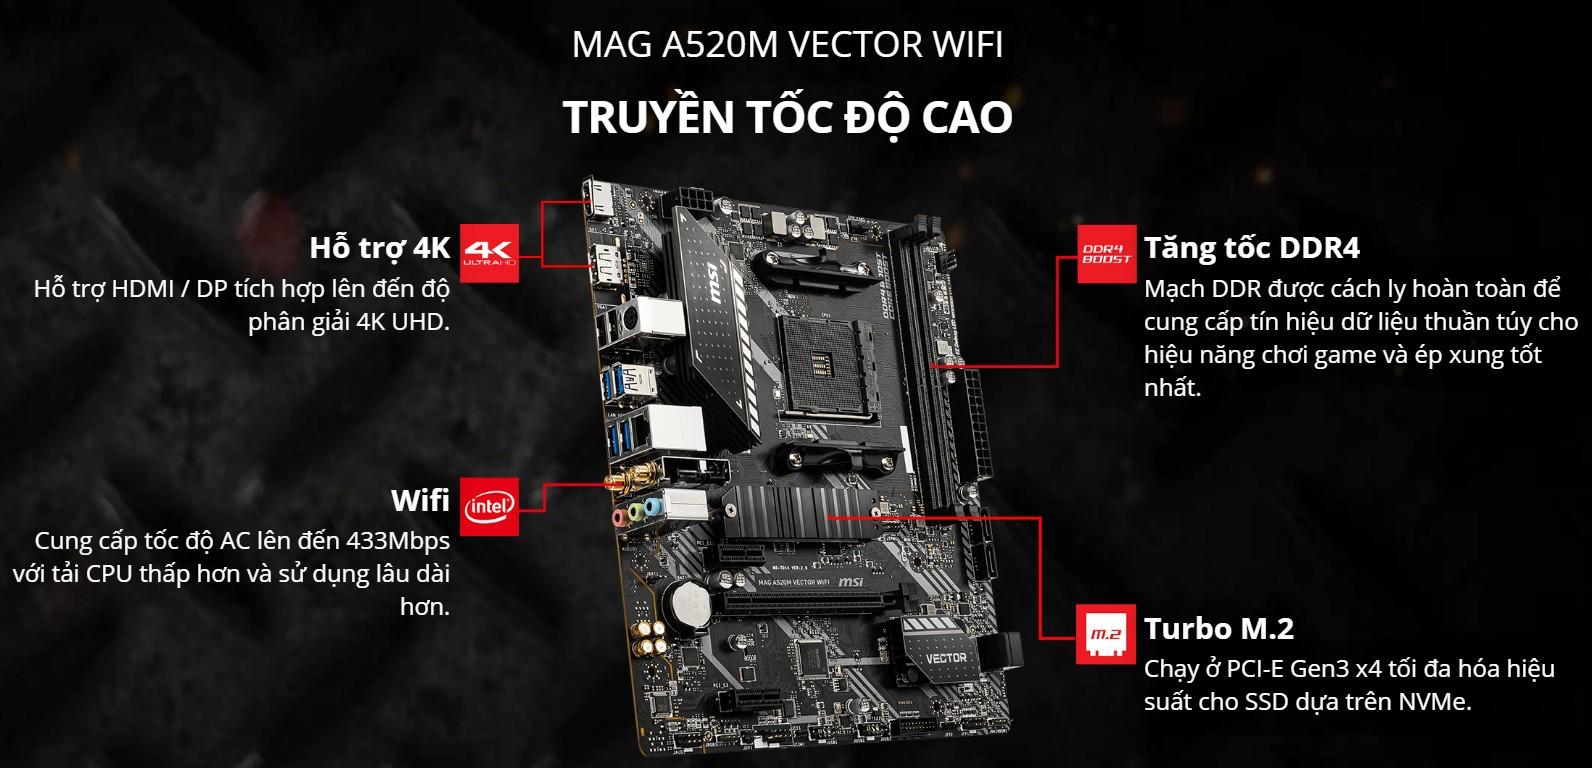 MAG A520M VECTOR WIFI